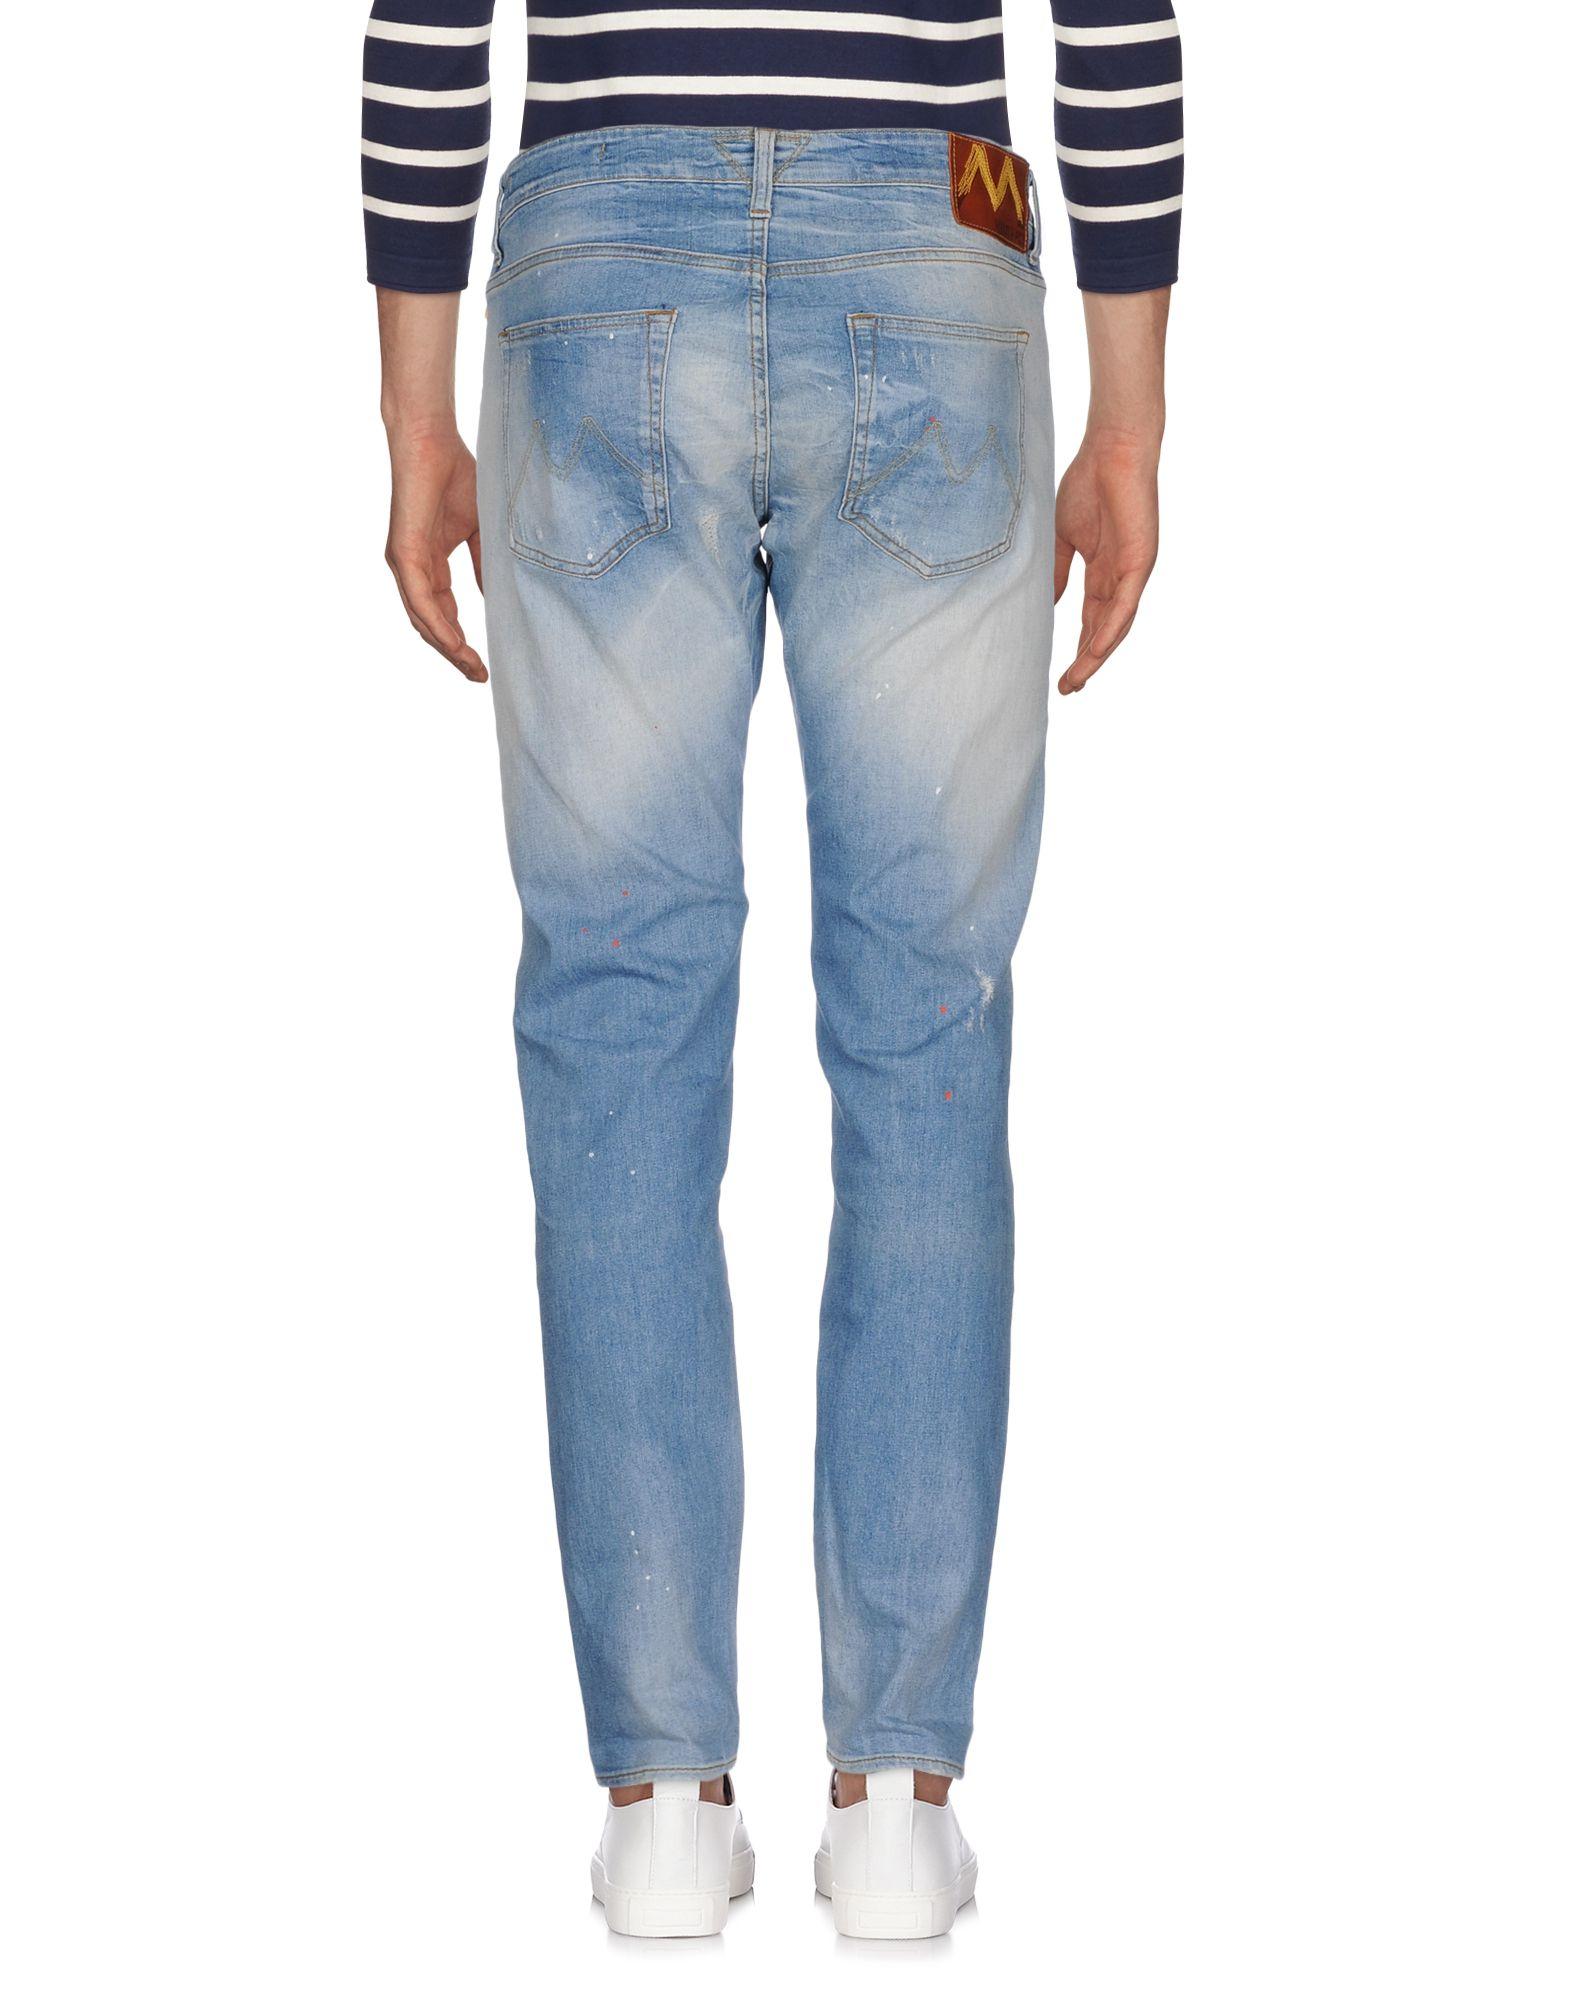 Pantaloni 42646464IA Jeans Meltin Pot Uomo - 42646464IA Pantaloni f5ac0f